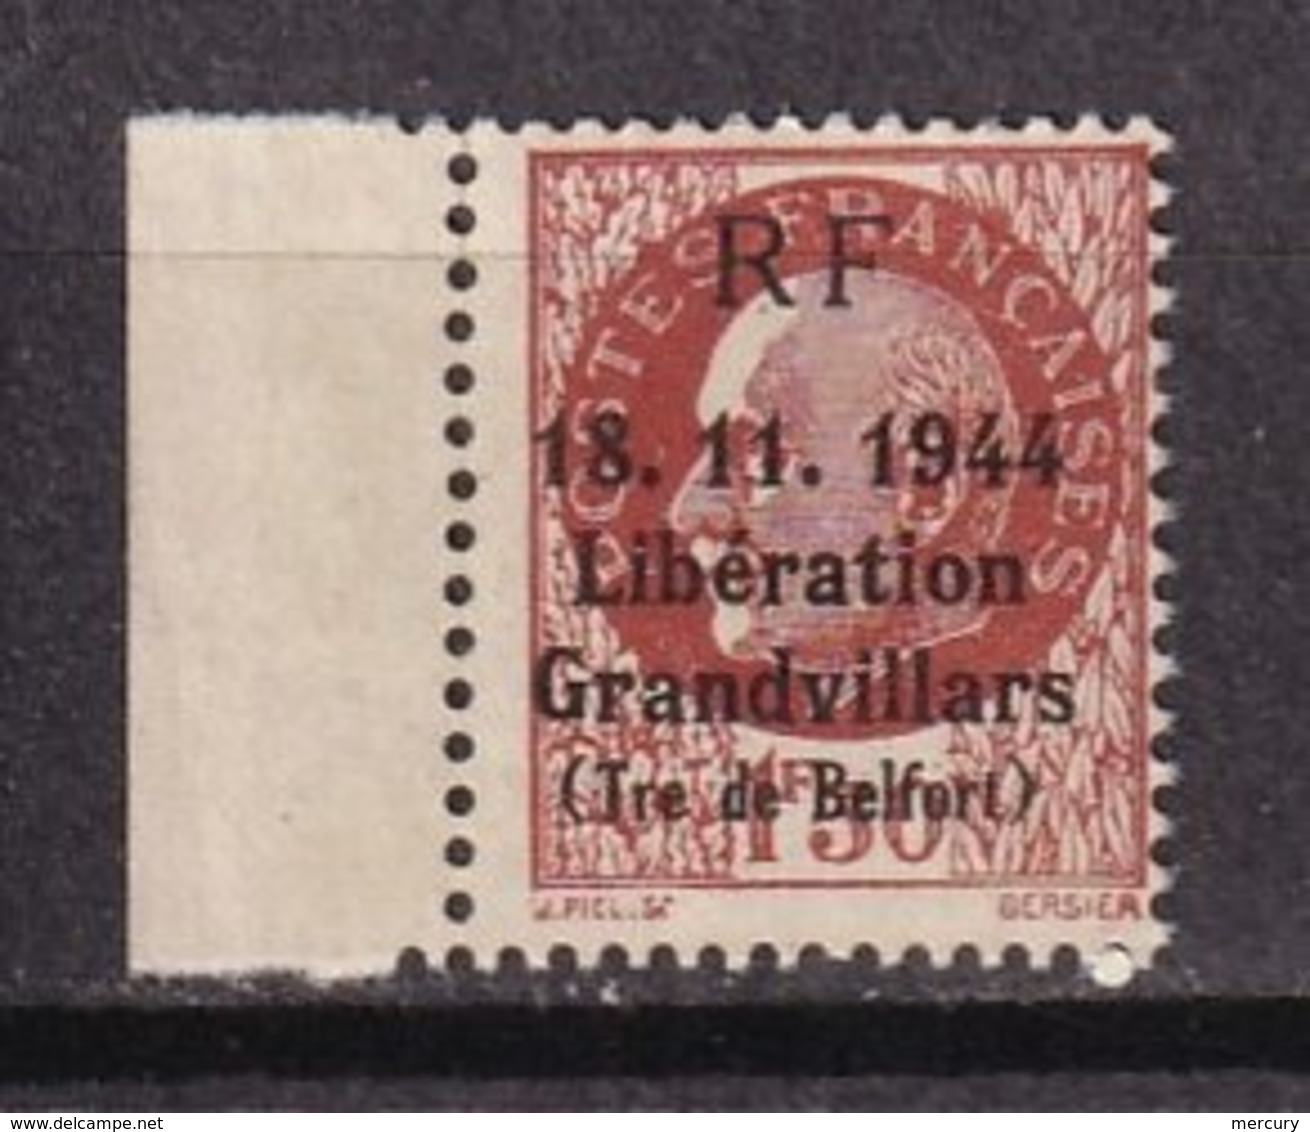 LIBERATION - Grandvillars -  5 Valeurs TB - Liberation